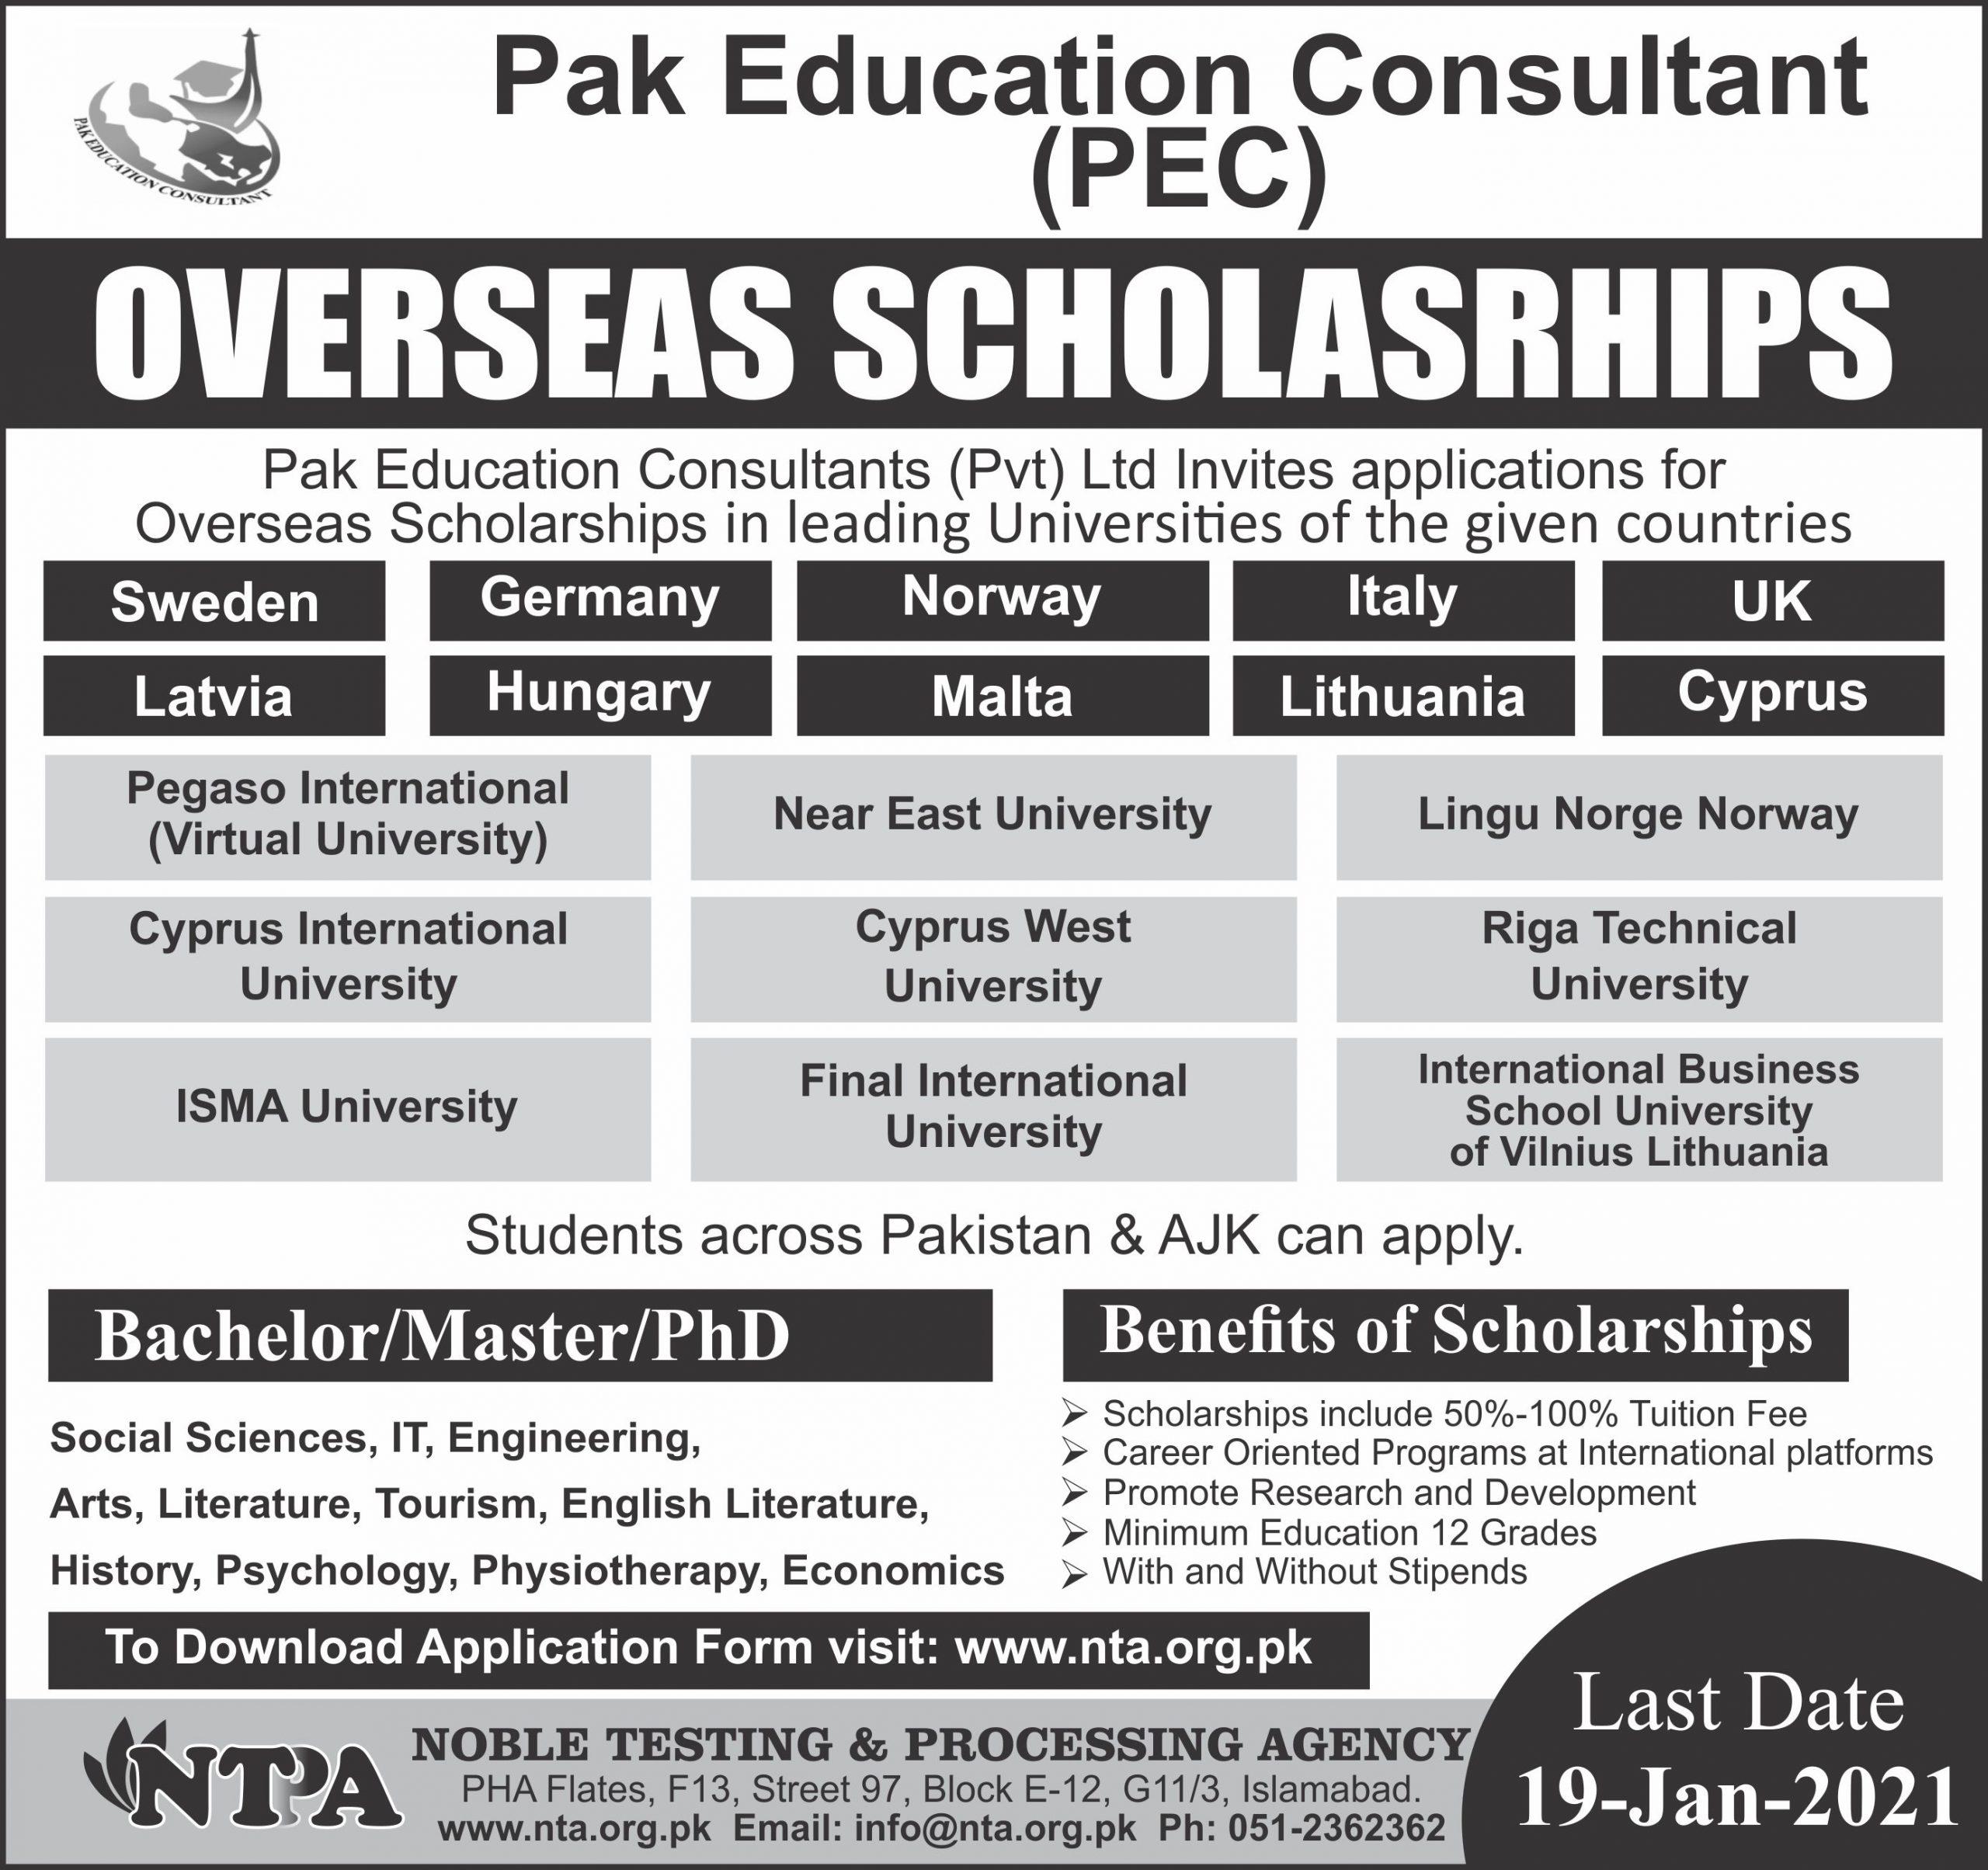 Pak Education Consultant PEC Scholarship Program NTPA Roll No Slip